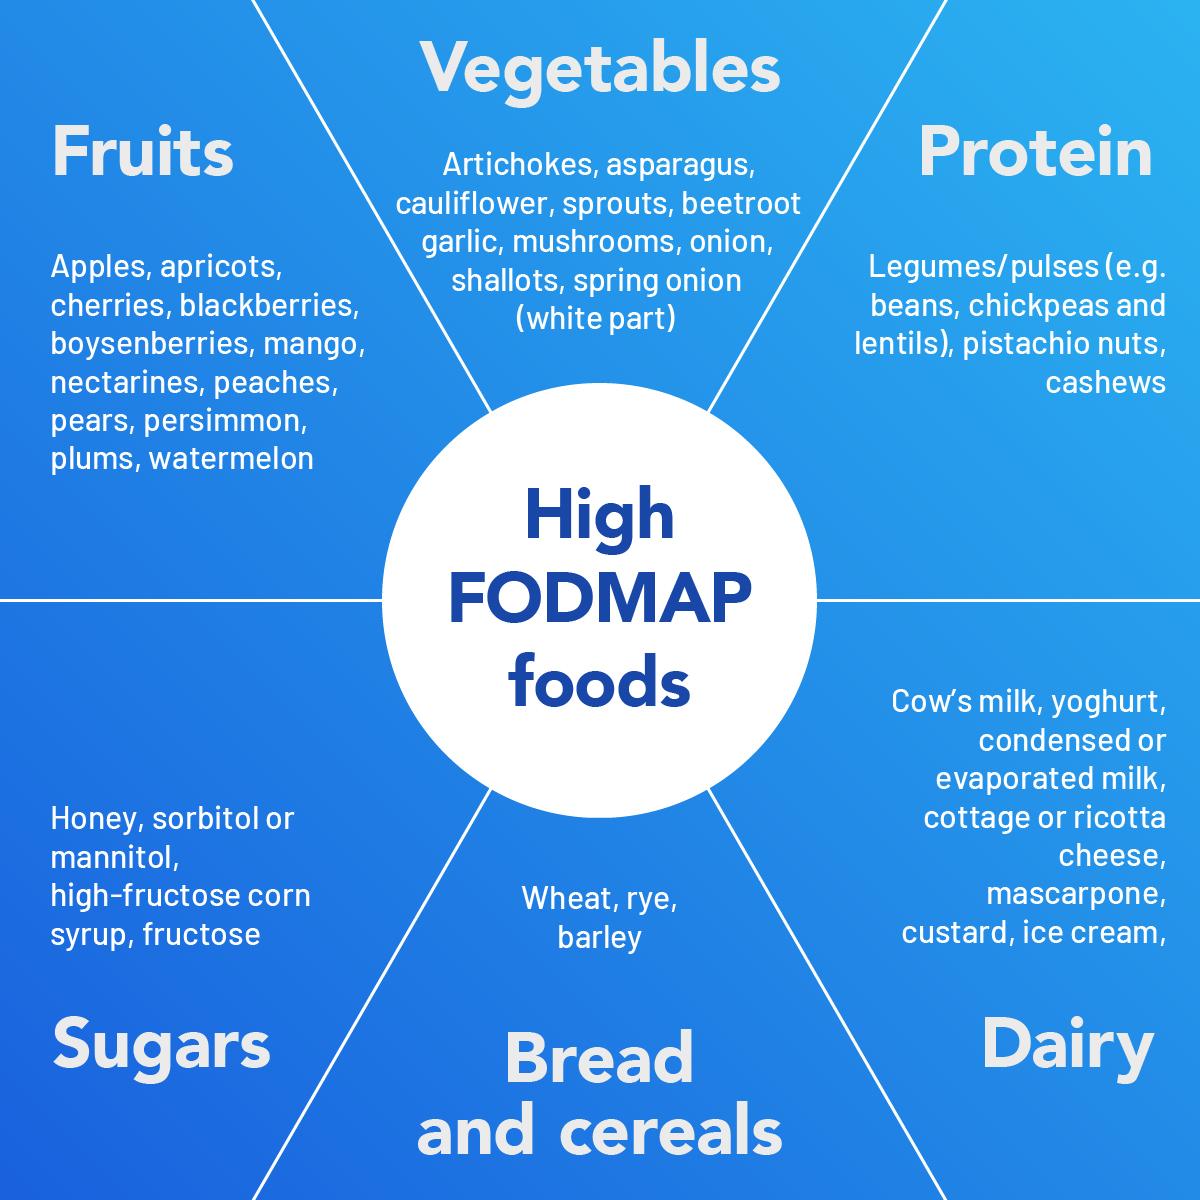 High FODMAP foods